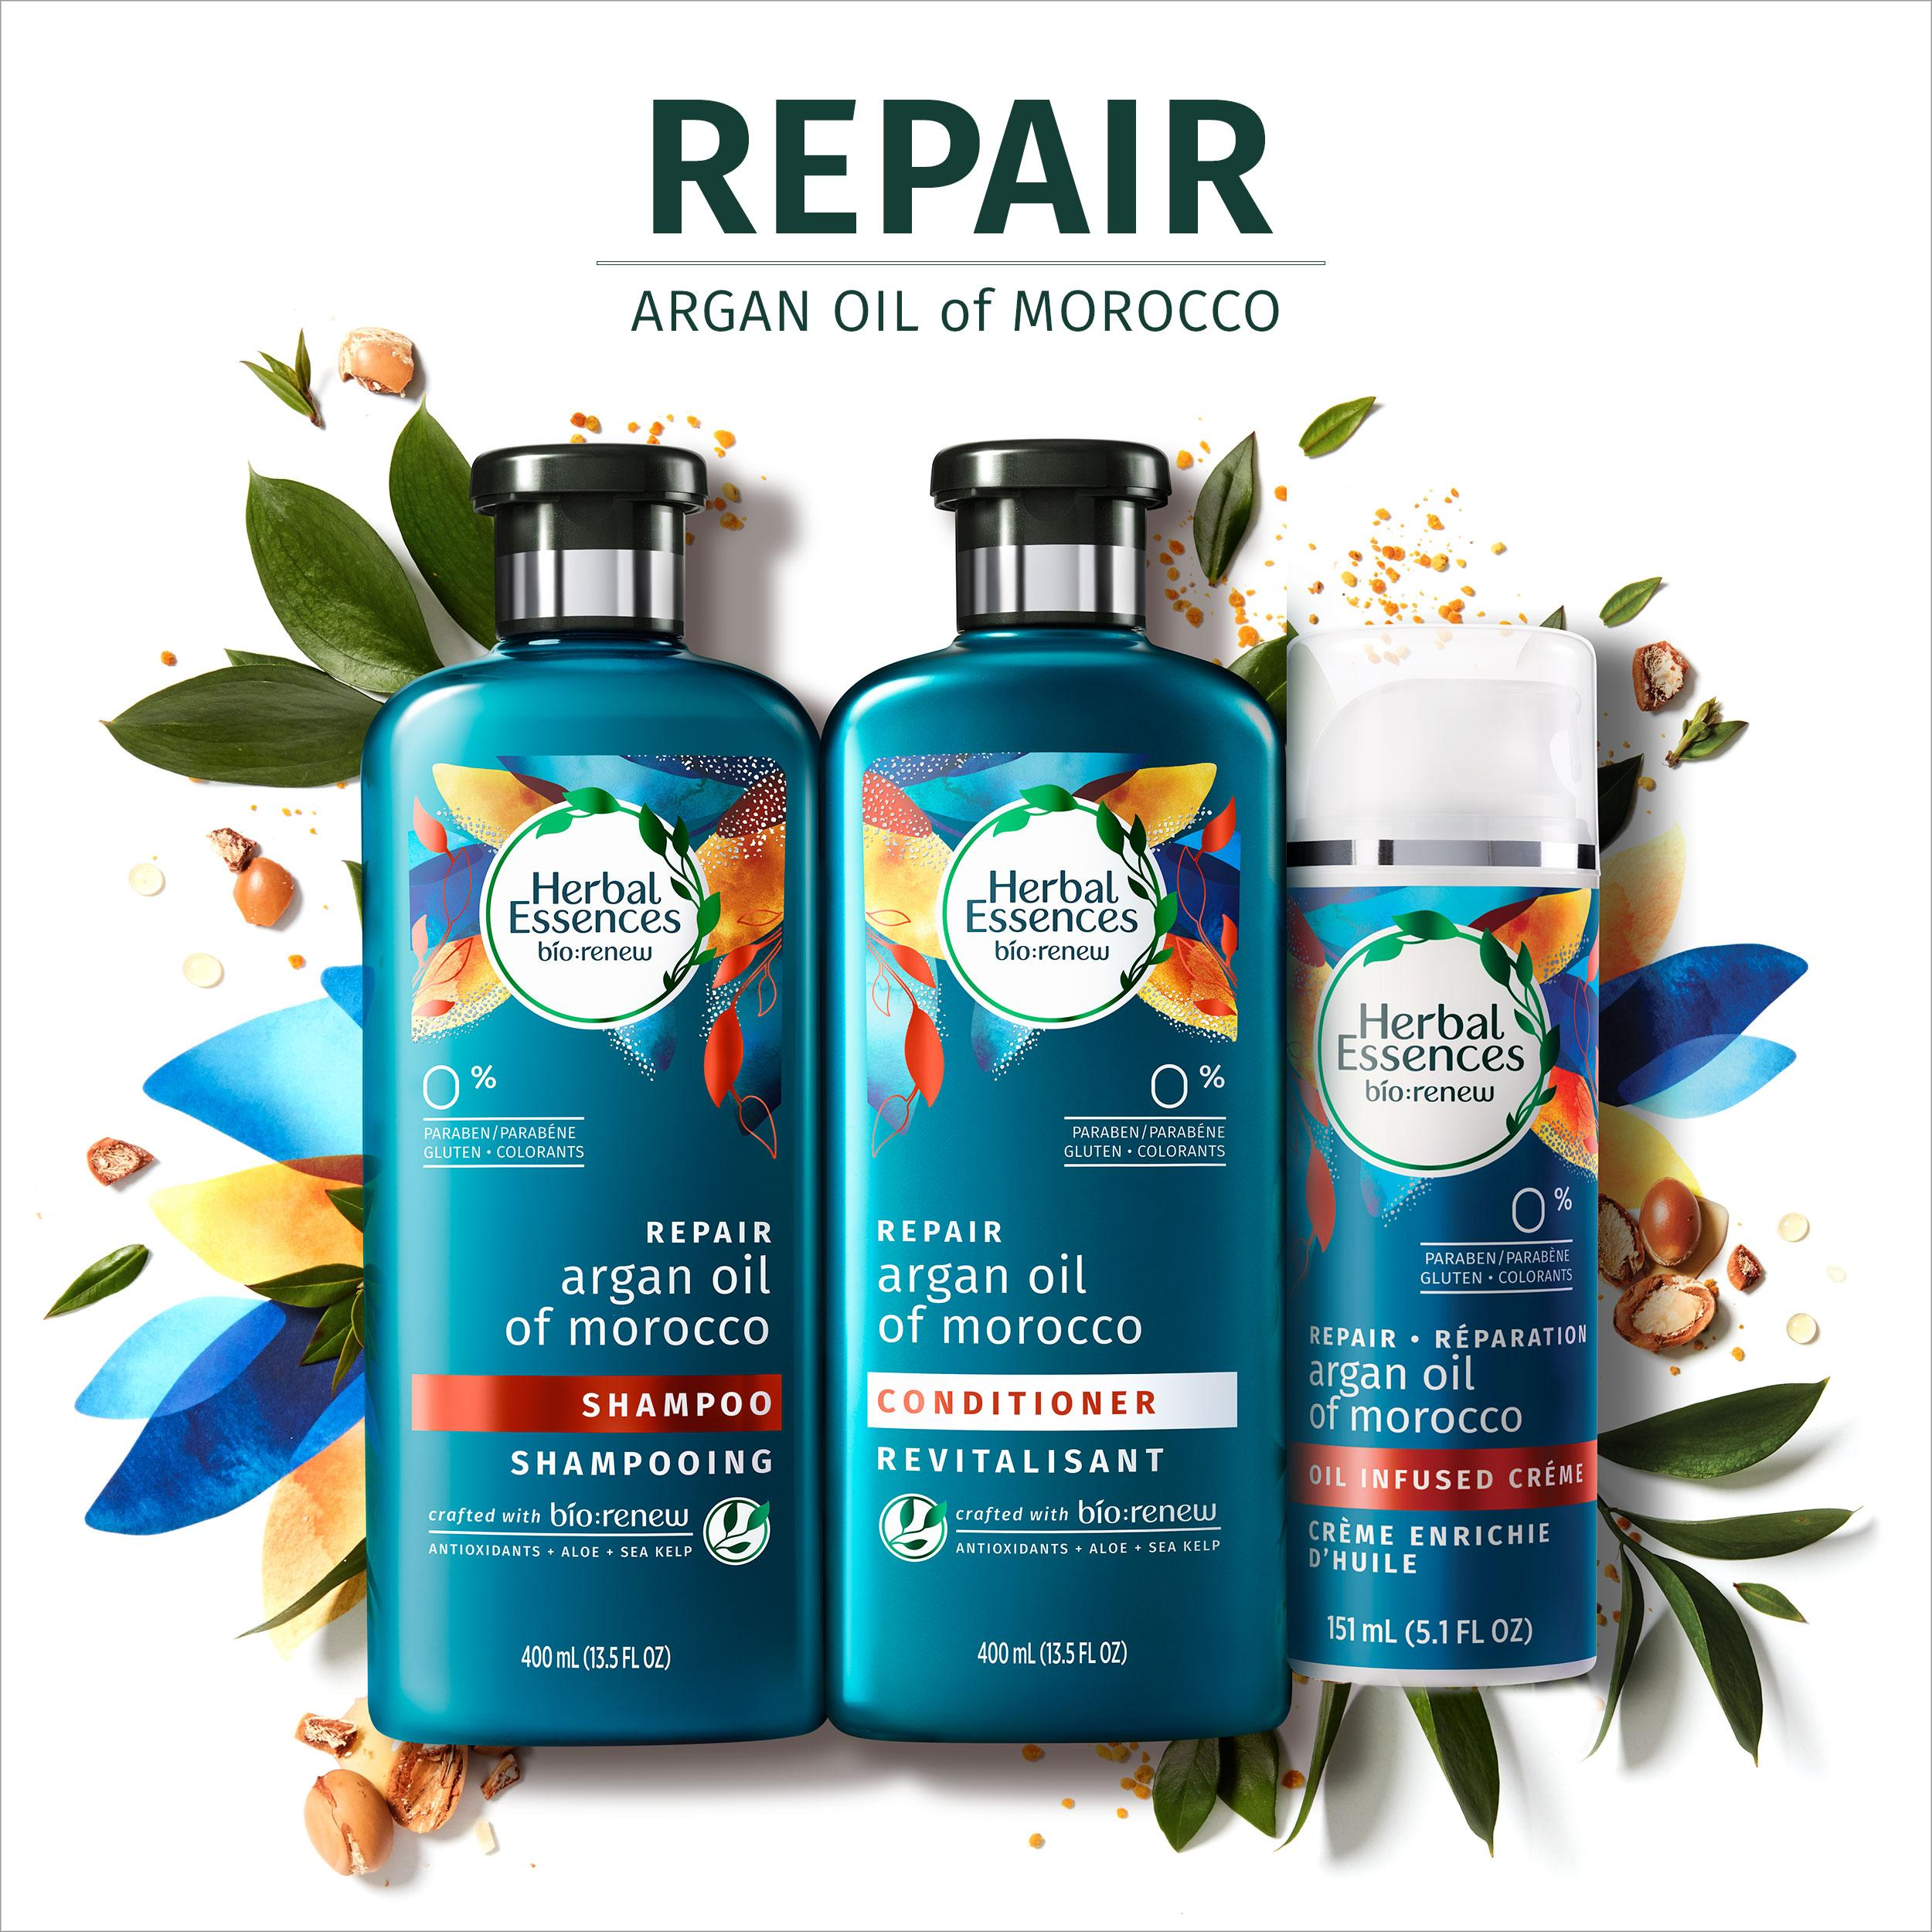 Amazon.com: Herbal Essences Biorenew Argan Oil of Morocco